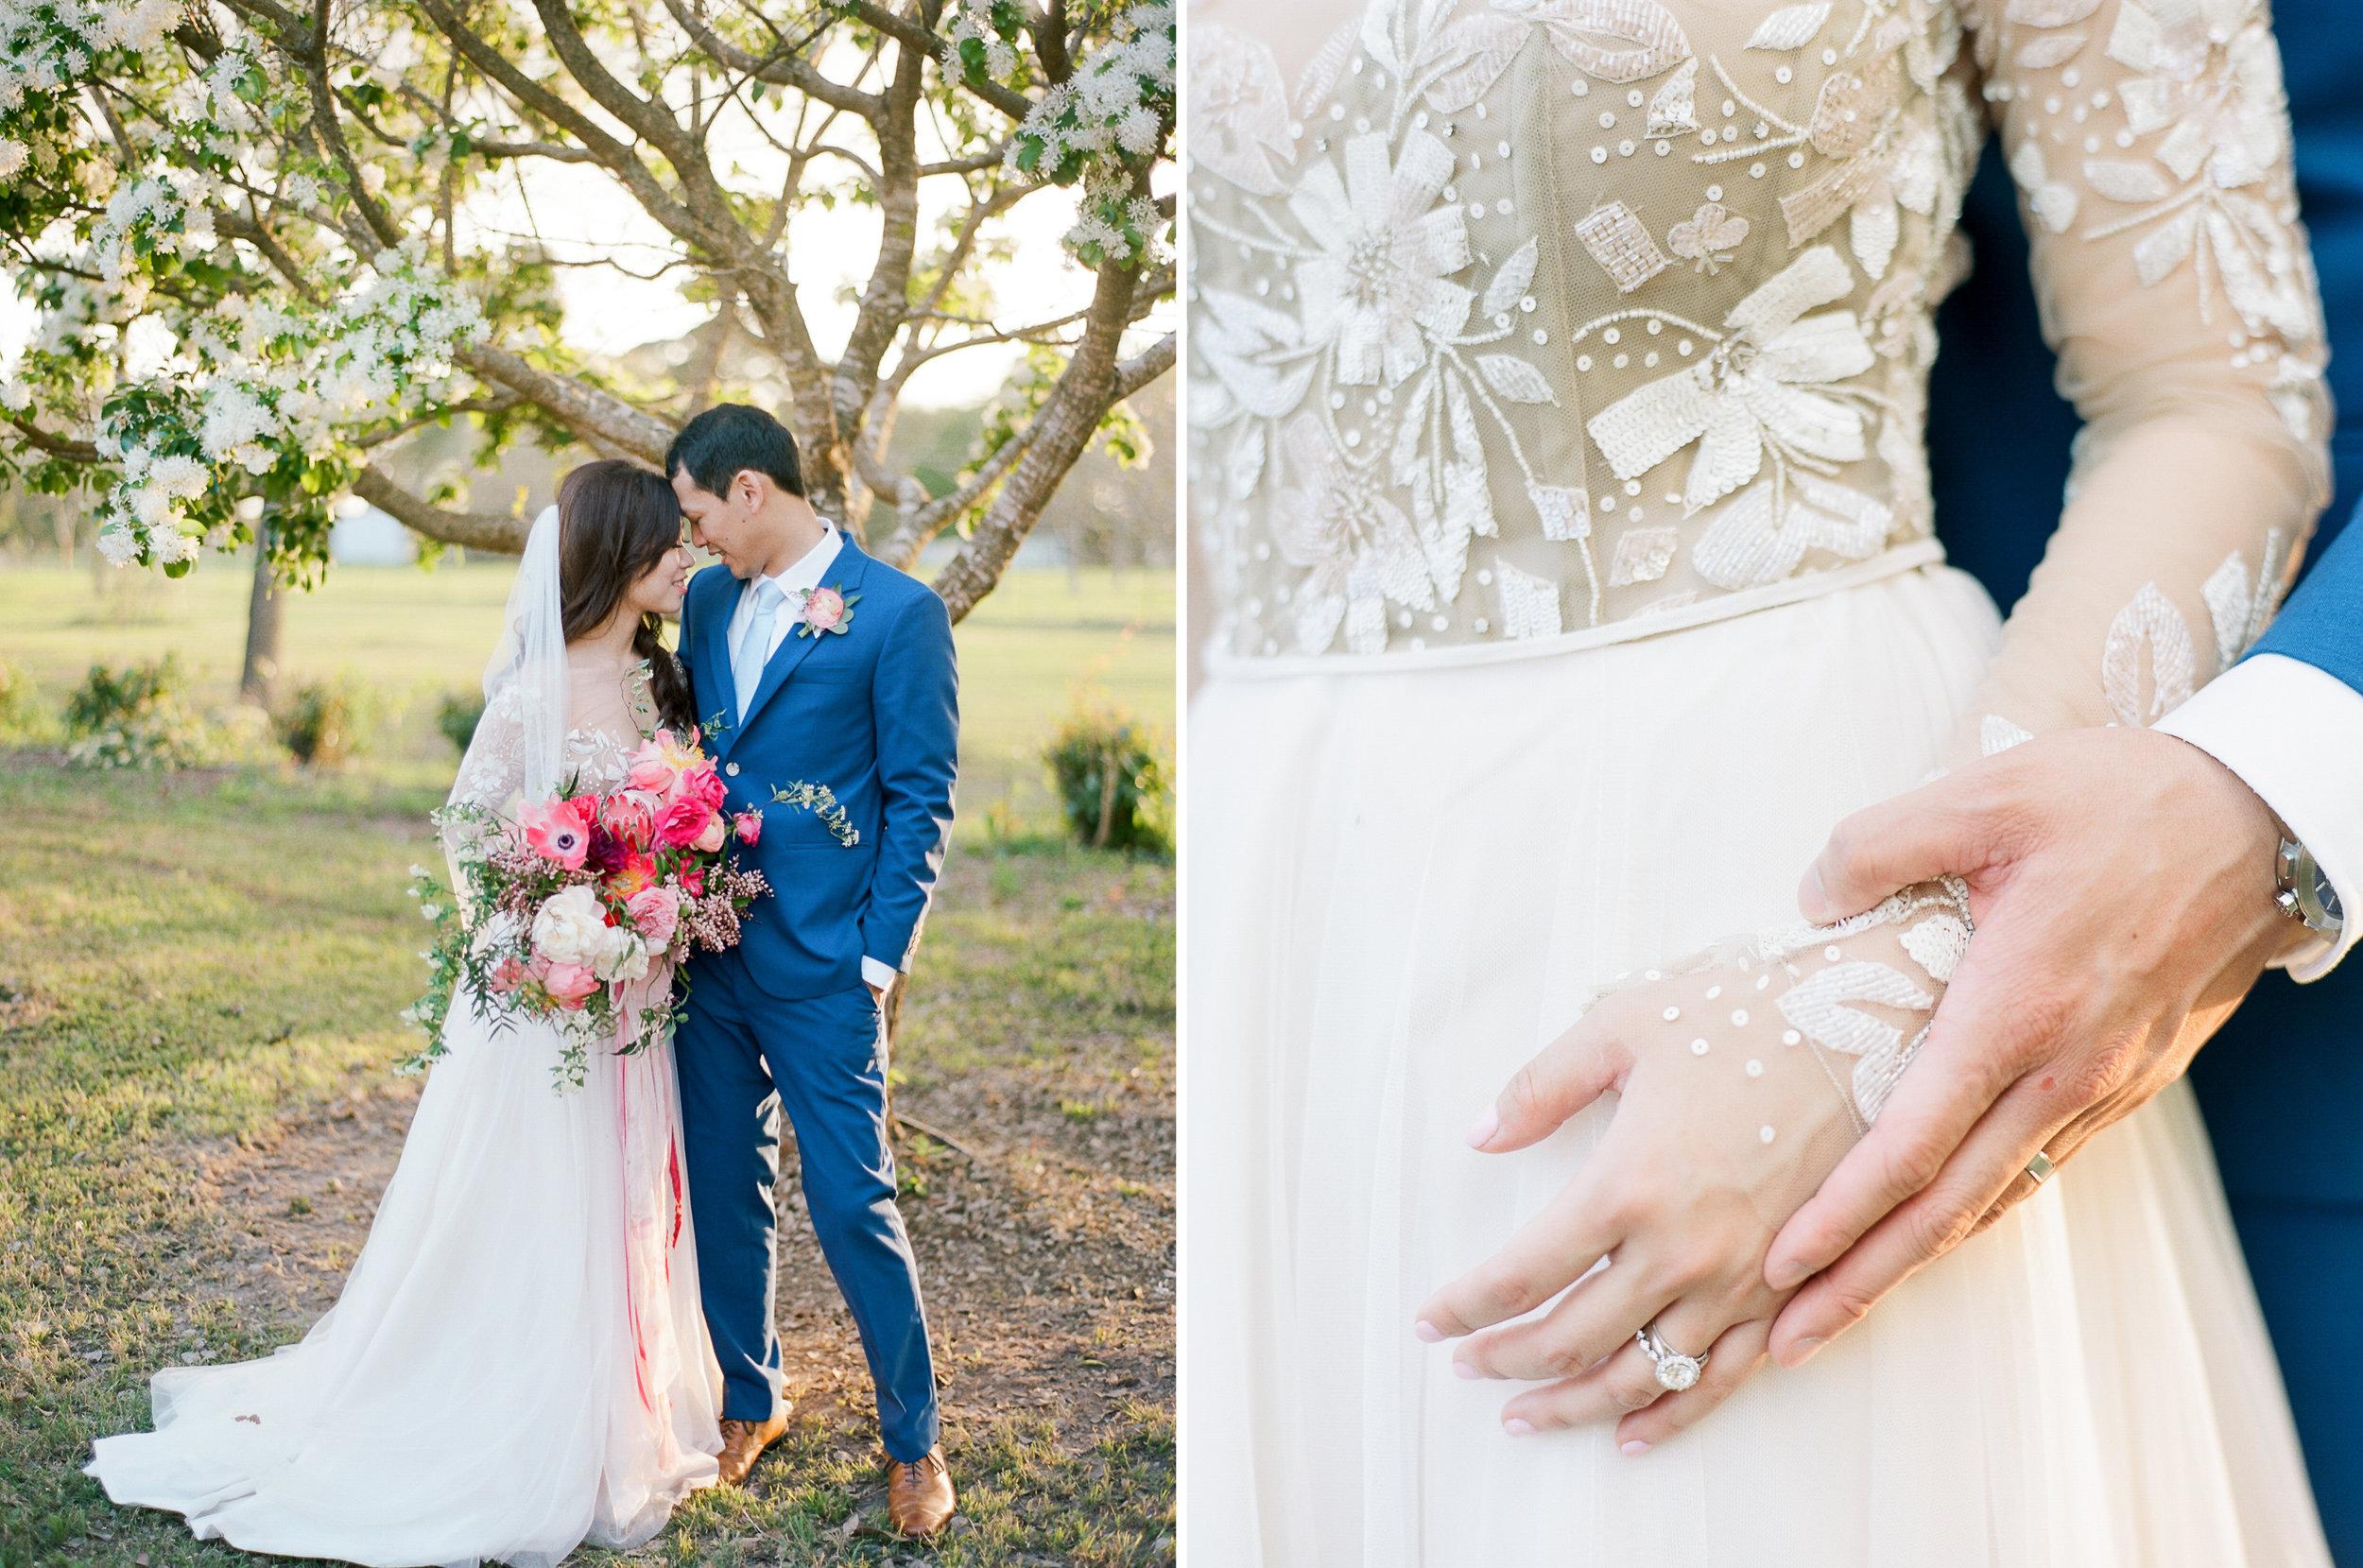 The-Knot-50-Weddings-50-States-Texas-Winner-Dana-Fernandez-photography-houston-wedding-photographer-film-fine-art-destination-131.jpg